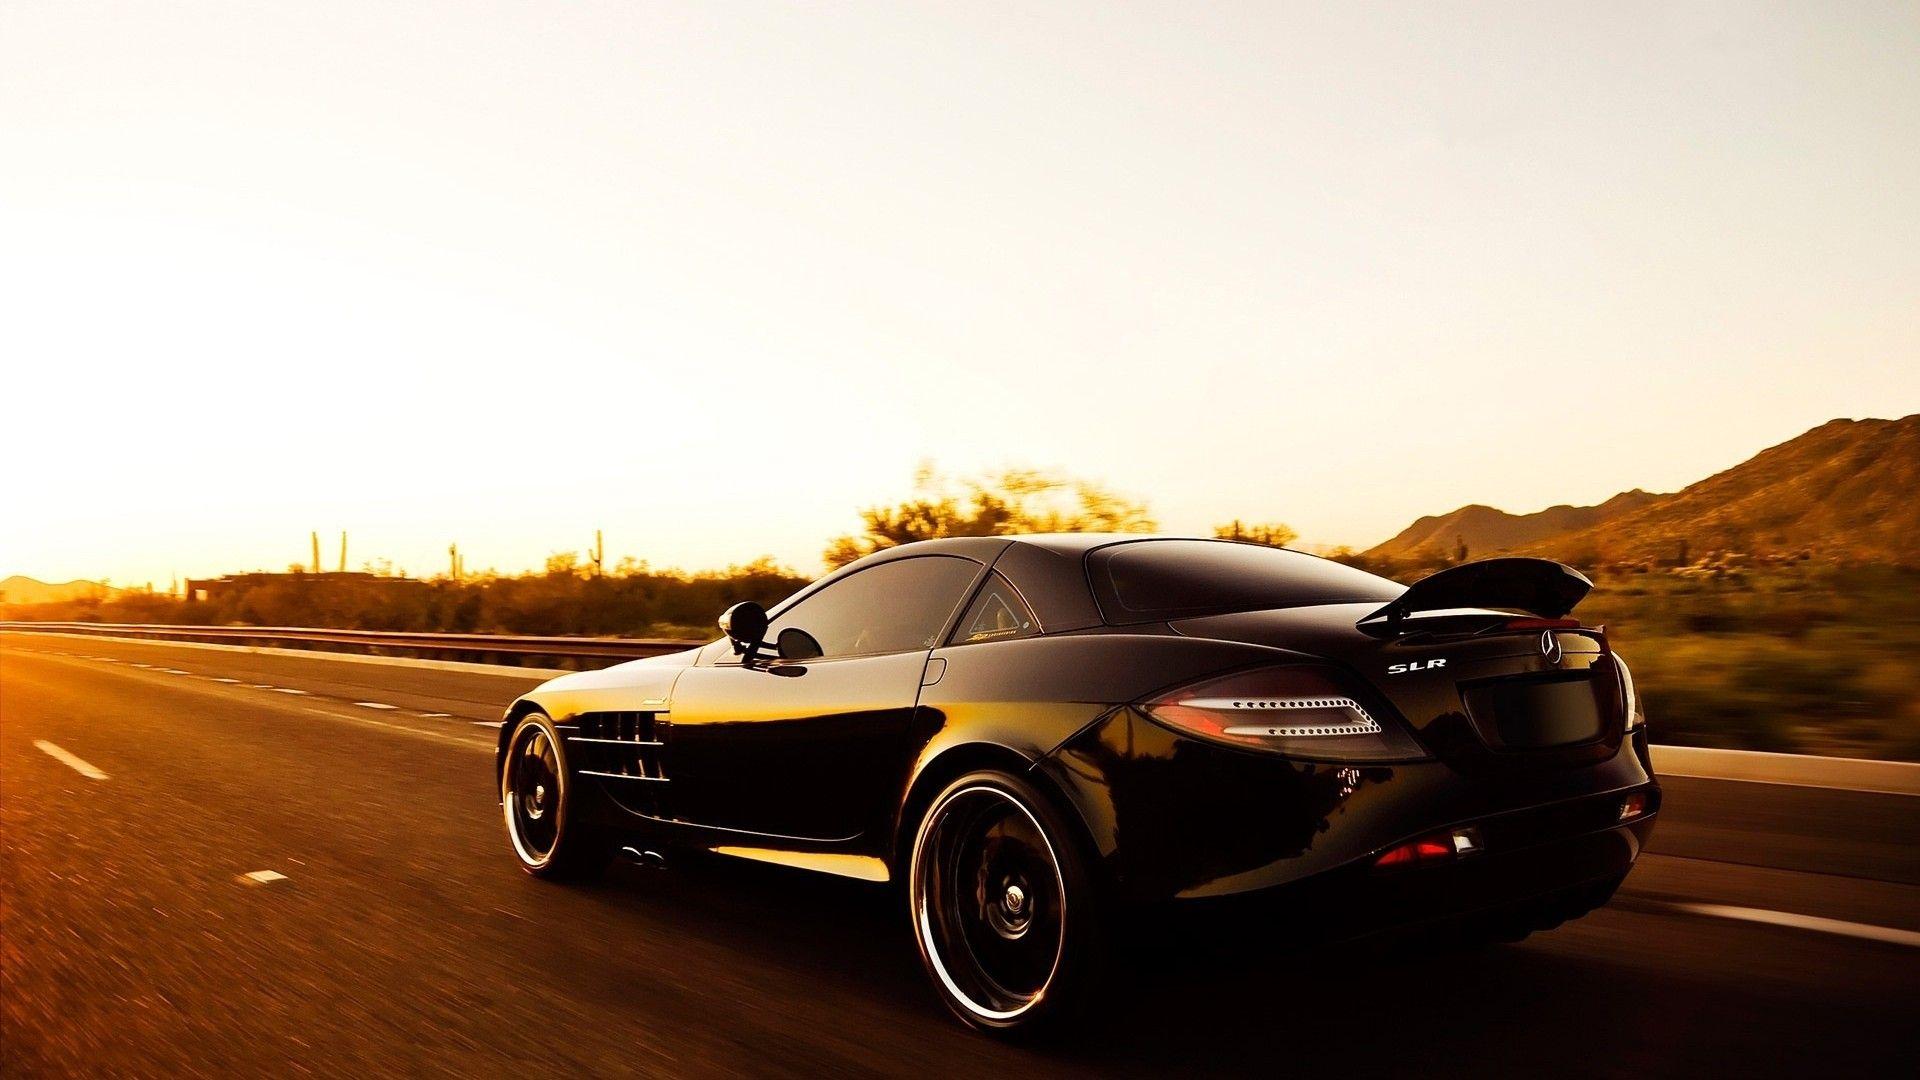 Download Black Mercedes Benz Slr Mclaren  Car Wallpaper Free By Warnerboutique Com